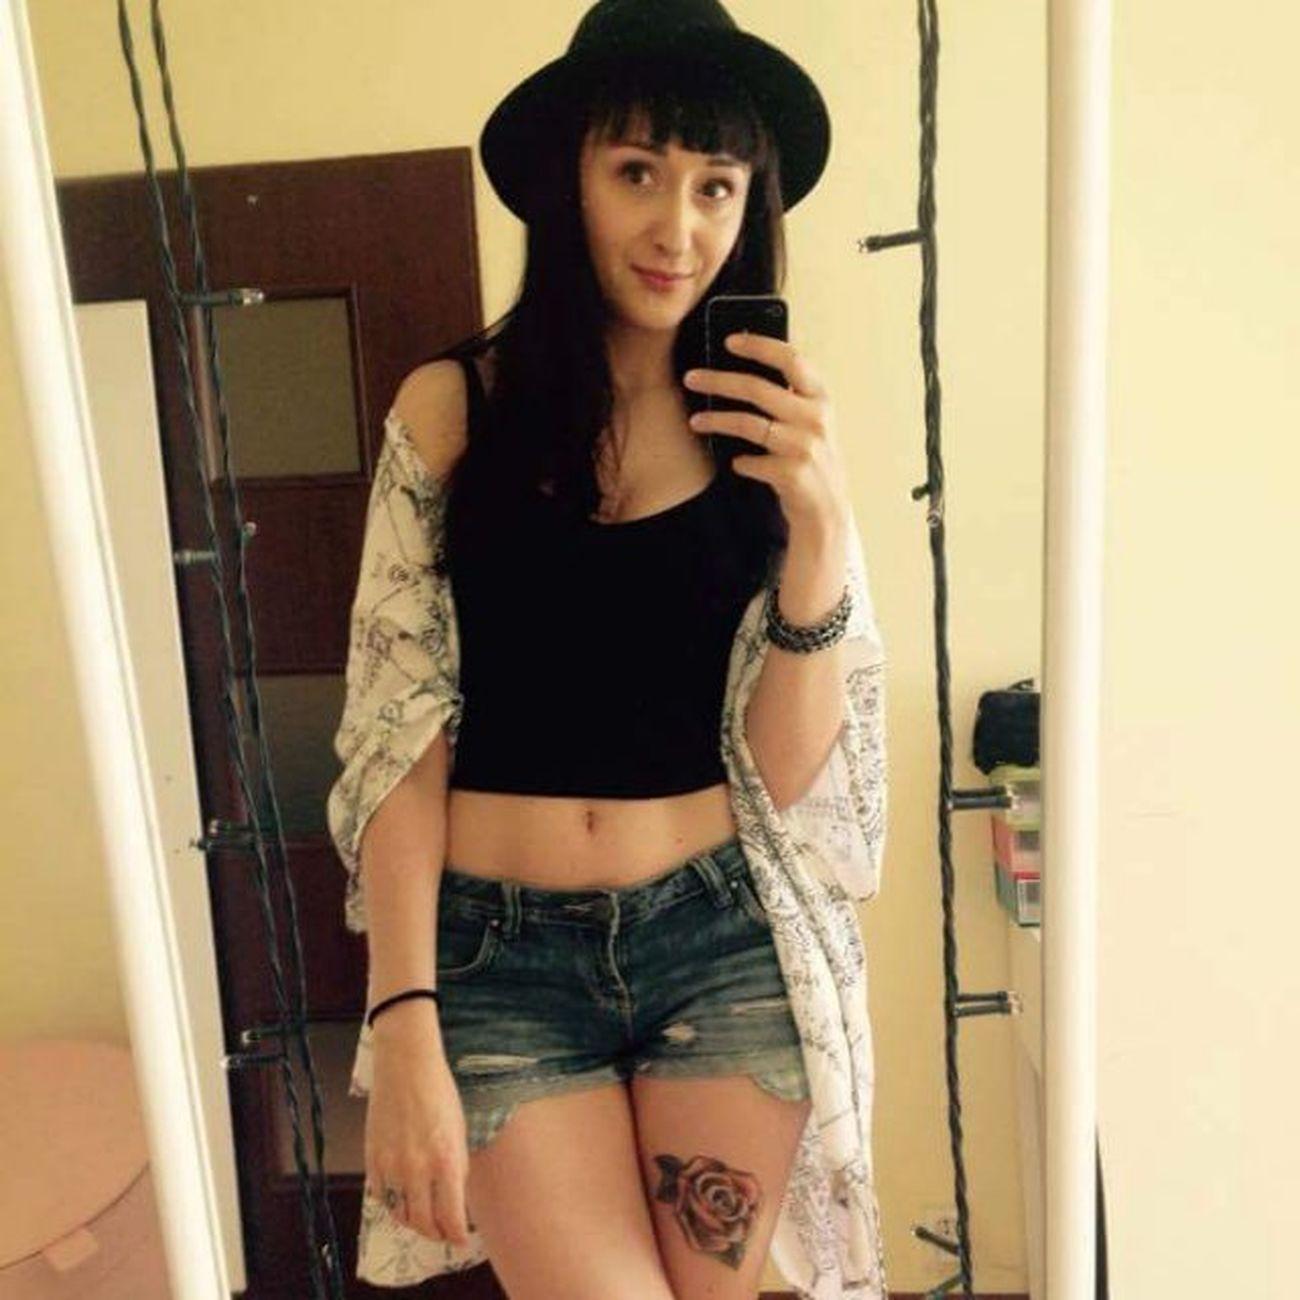 Aby do wakacji! Polishgirl Warszawa  Girl Brunette Tatuaż Tattoo Natolin Selfie Me Panigosiamaluje Makeup Makeupartist Belly Shorts